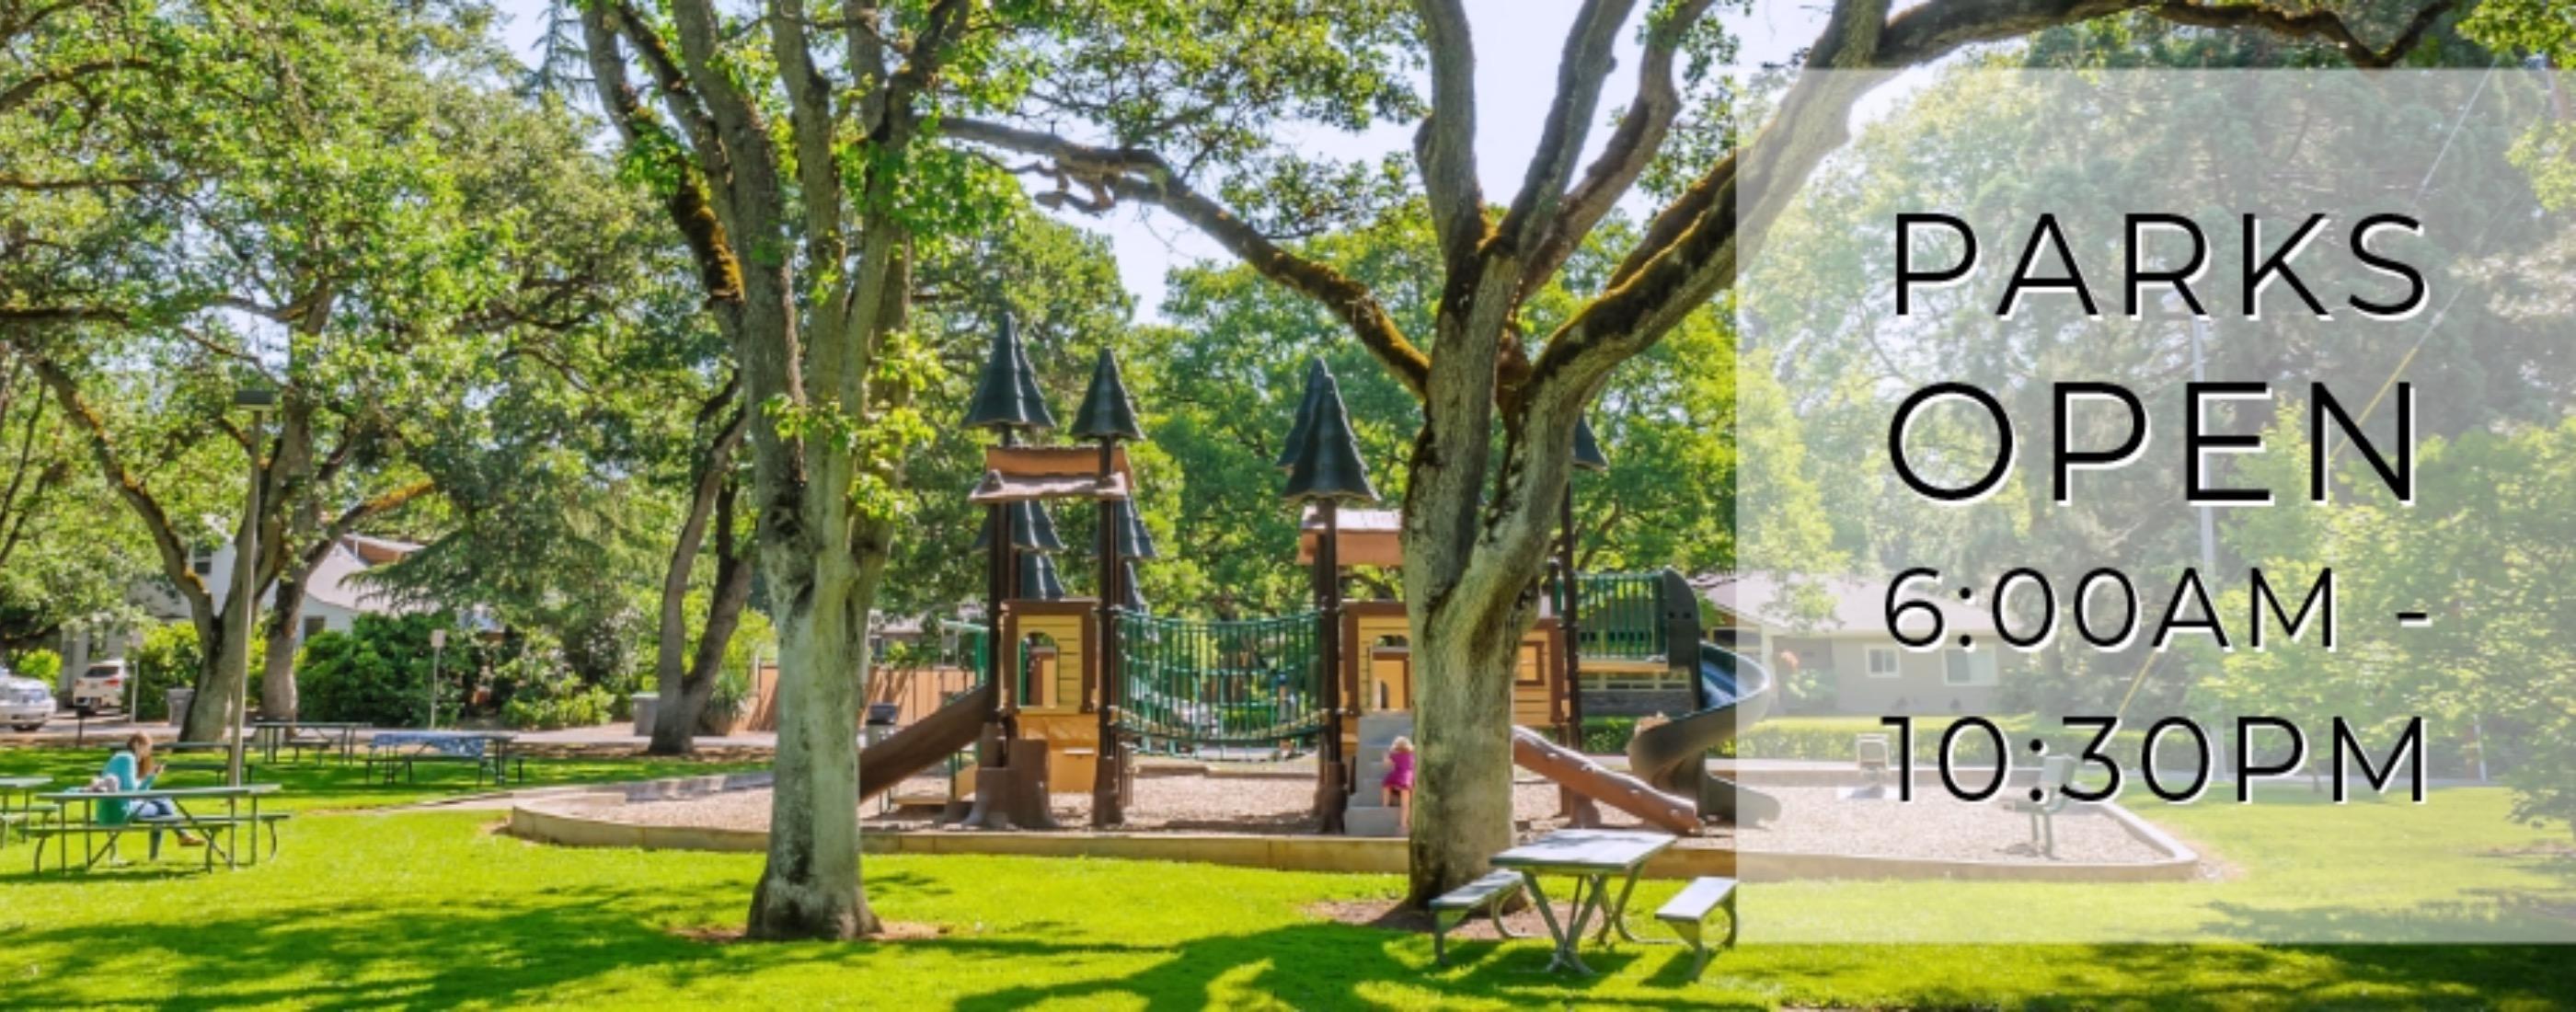 Medford City Parks